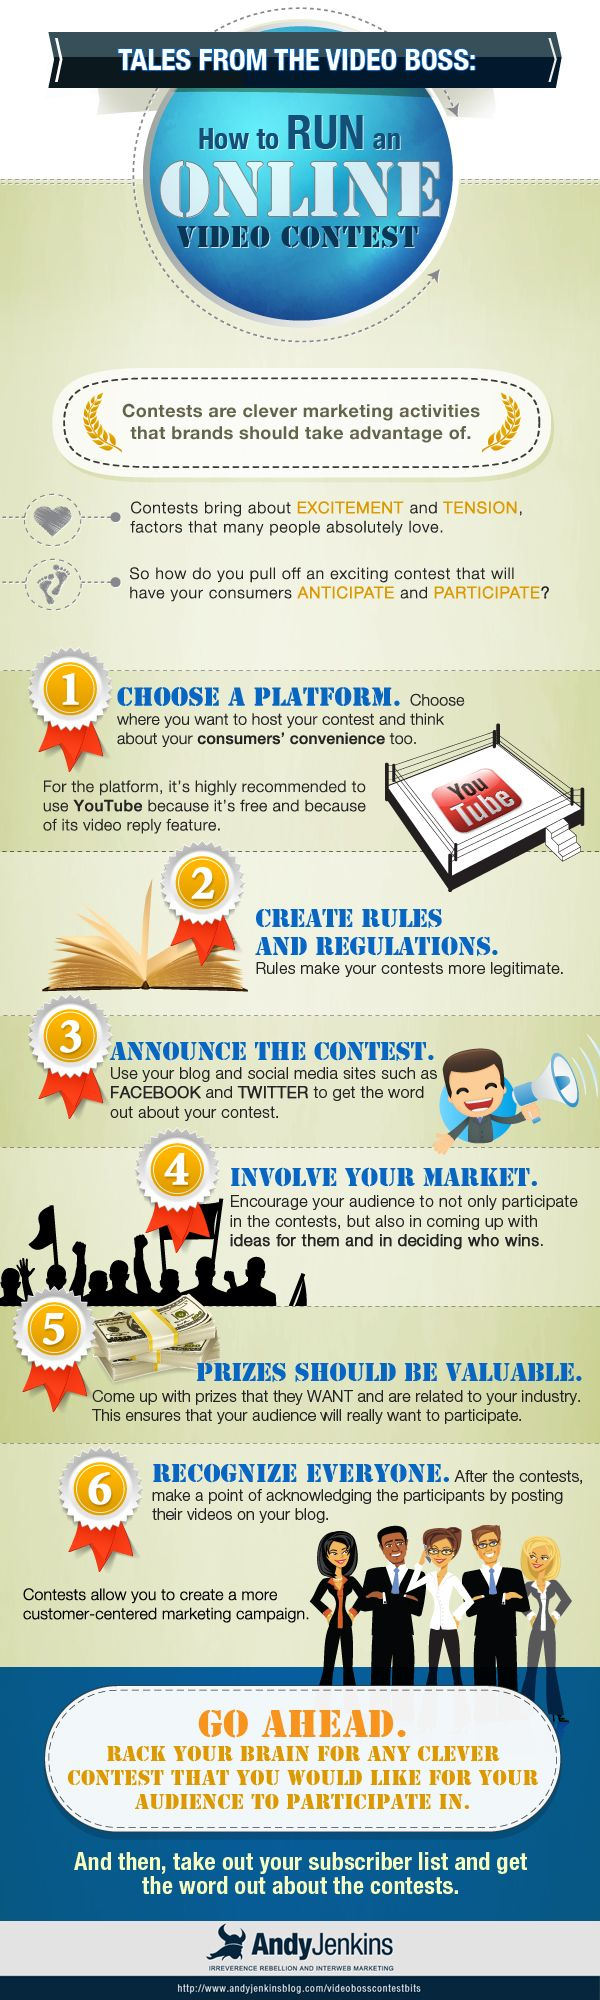 Video Boss Bits: Running an Online Video Contest (Infographic)